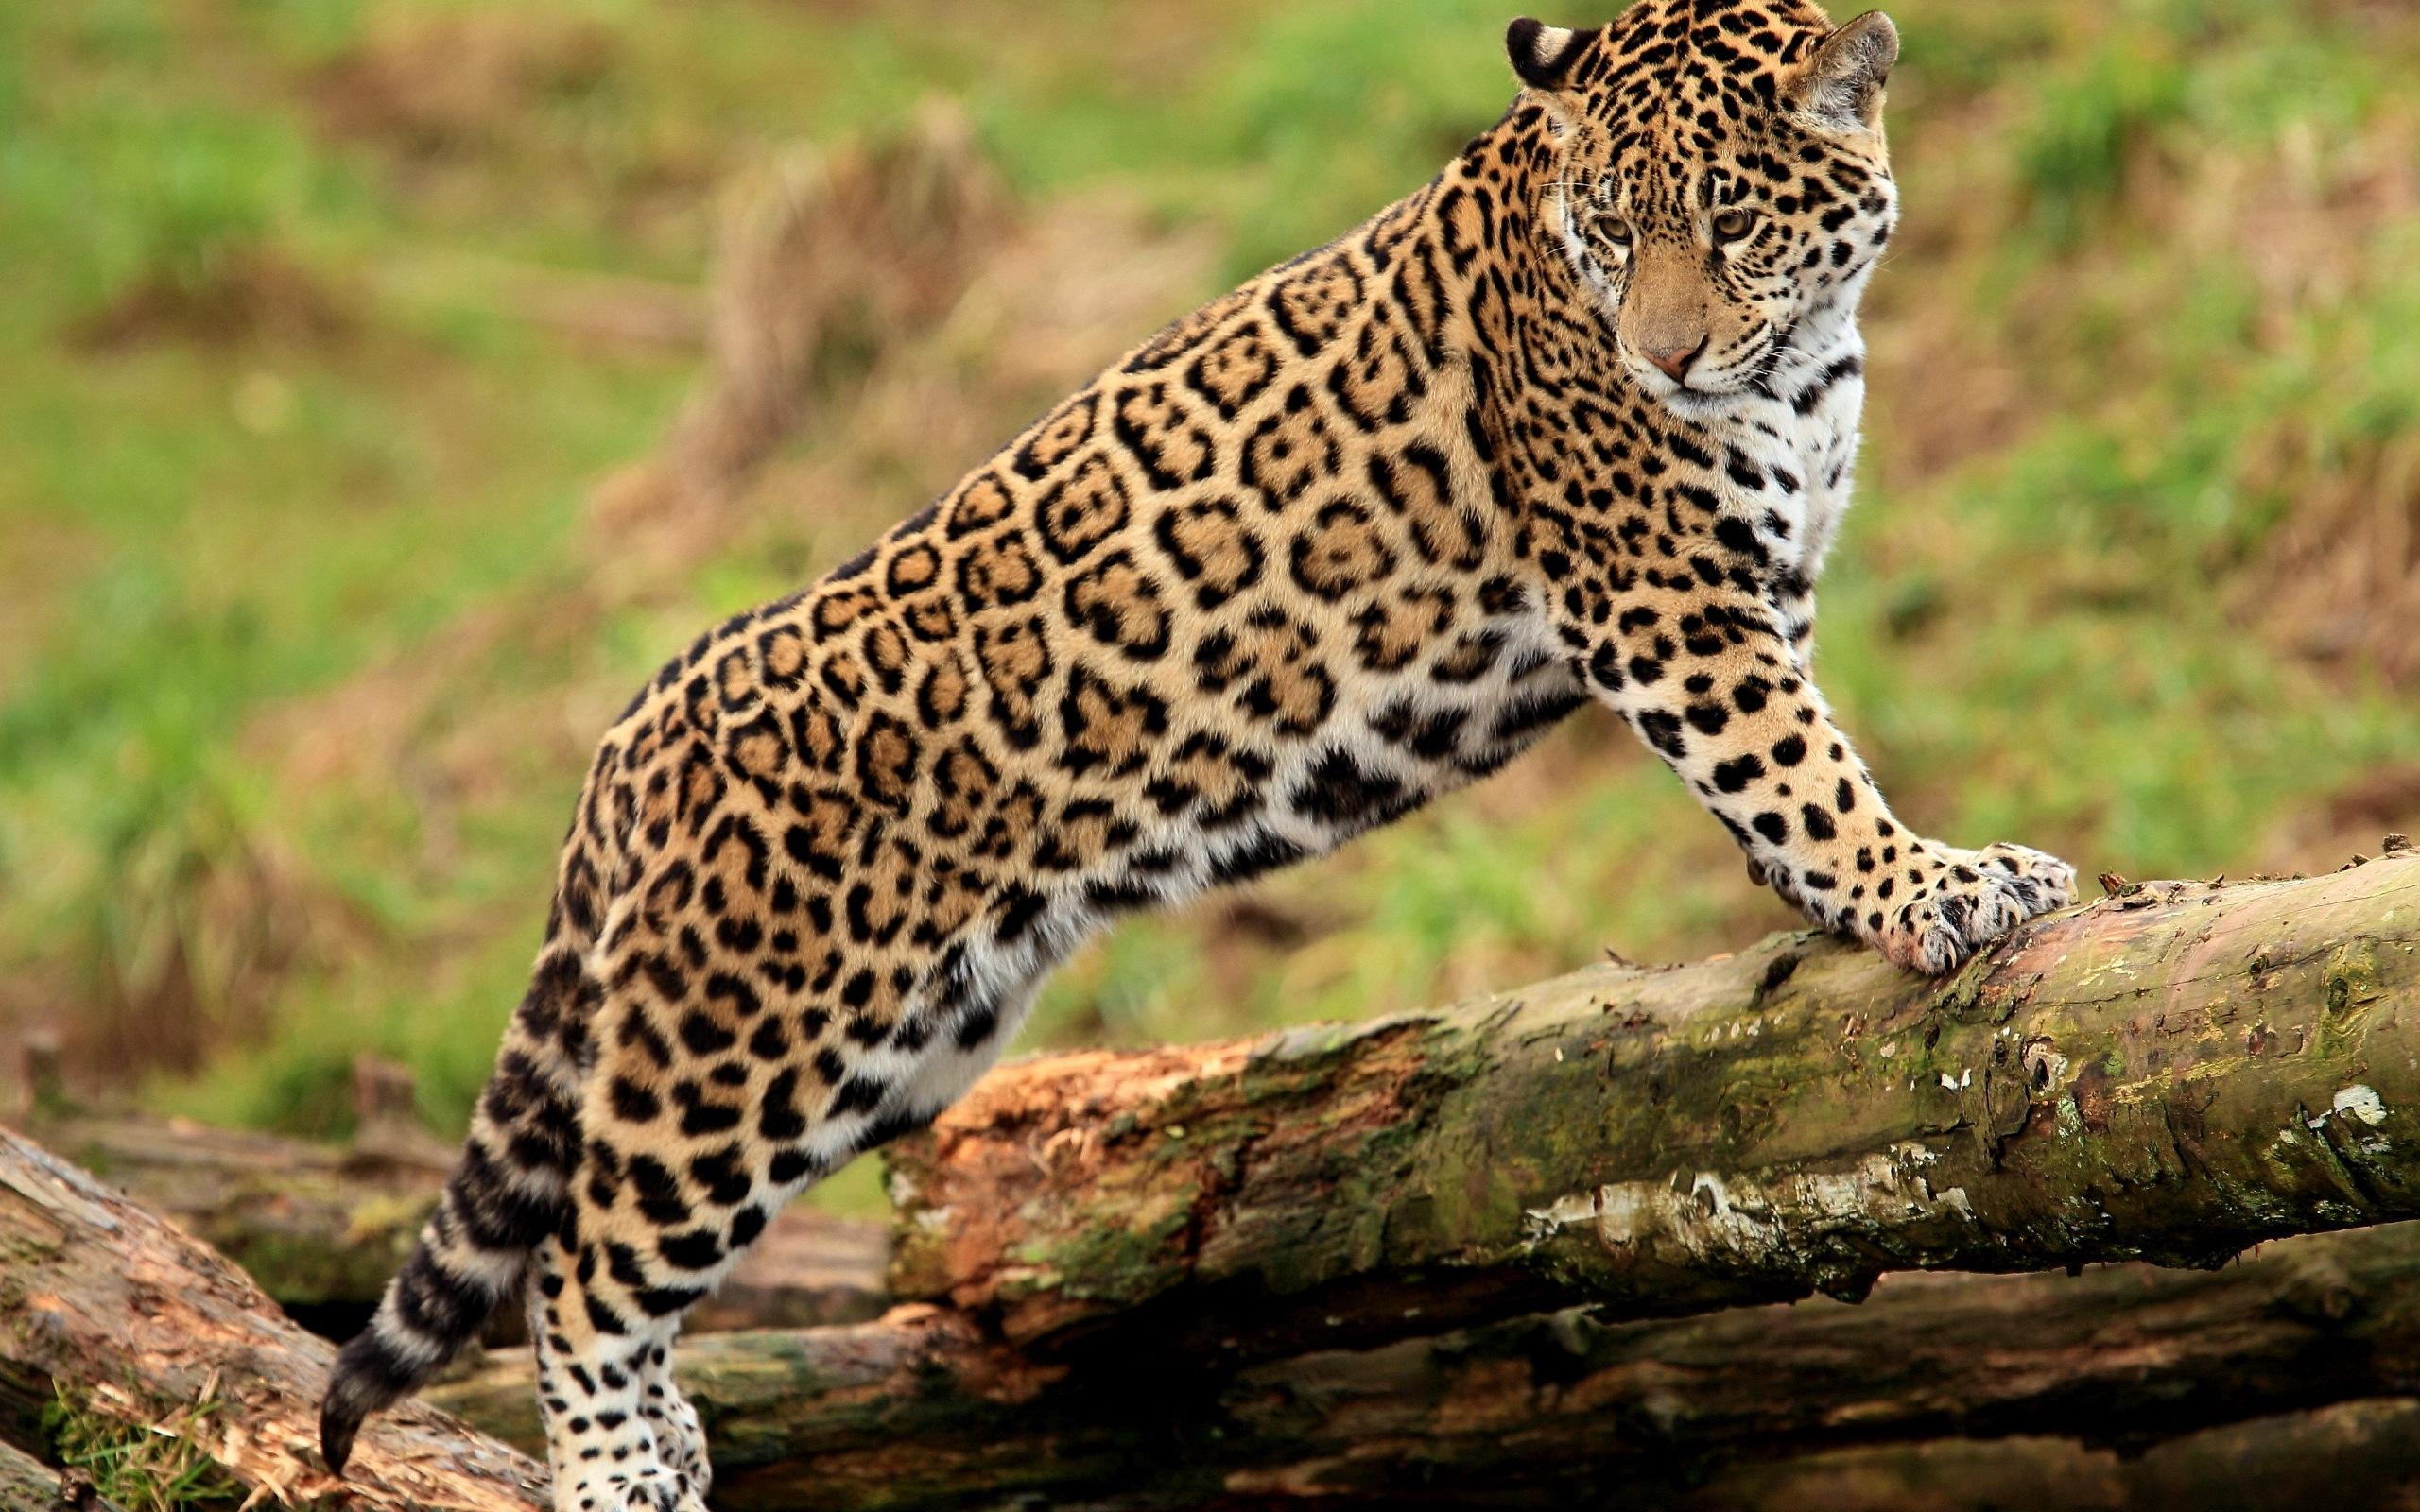 Затаившийся гепард  № 699246 бесплатно